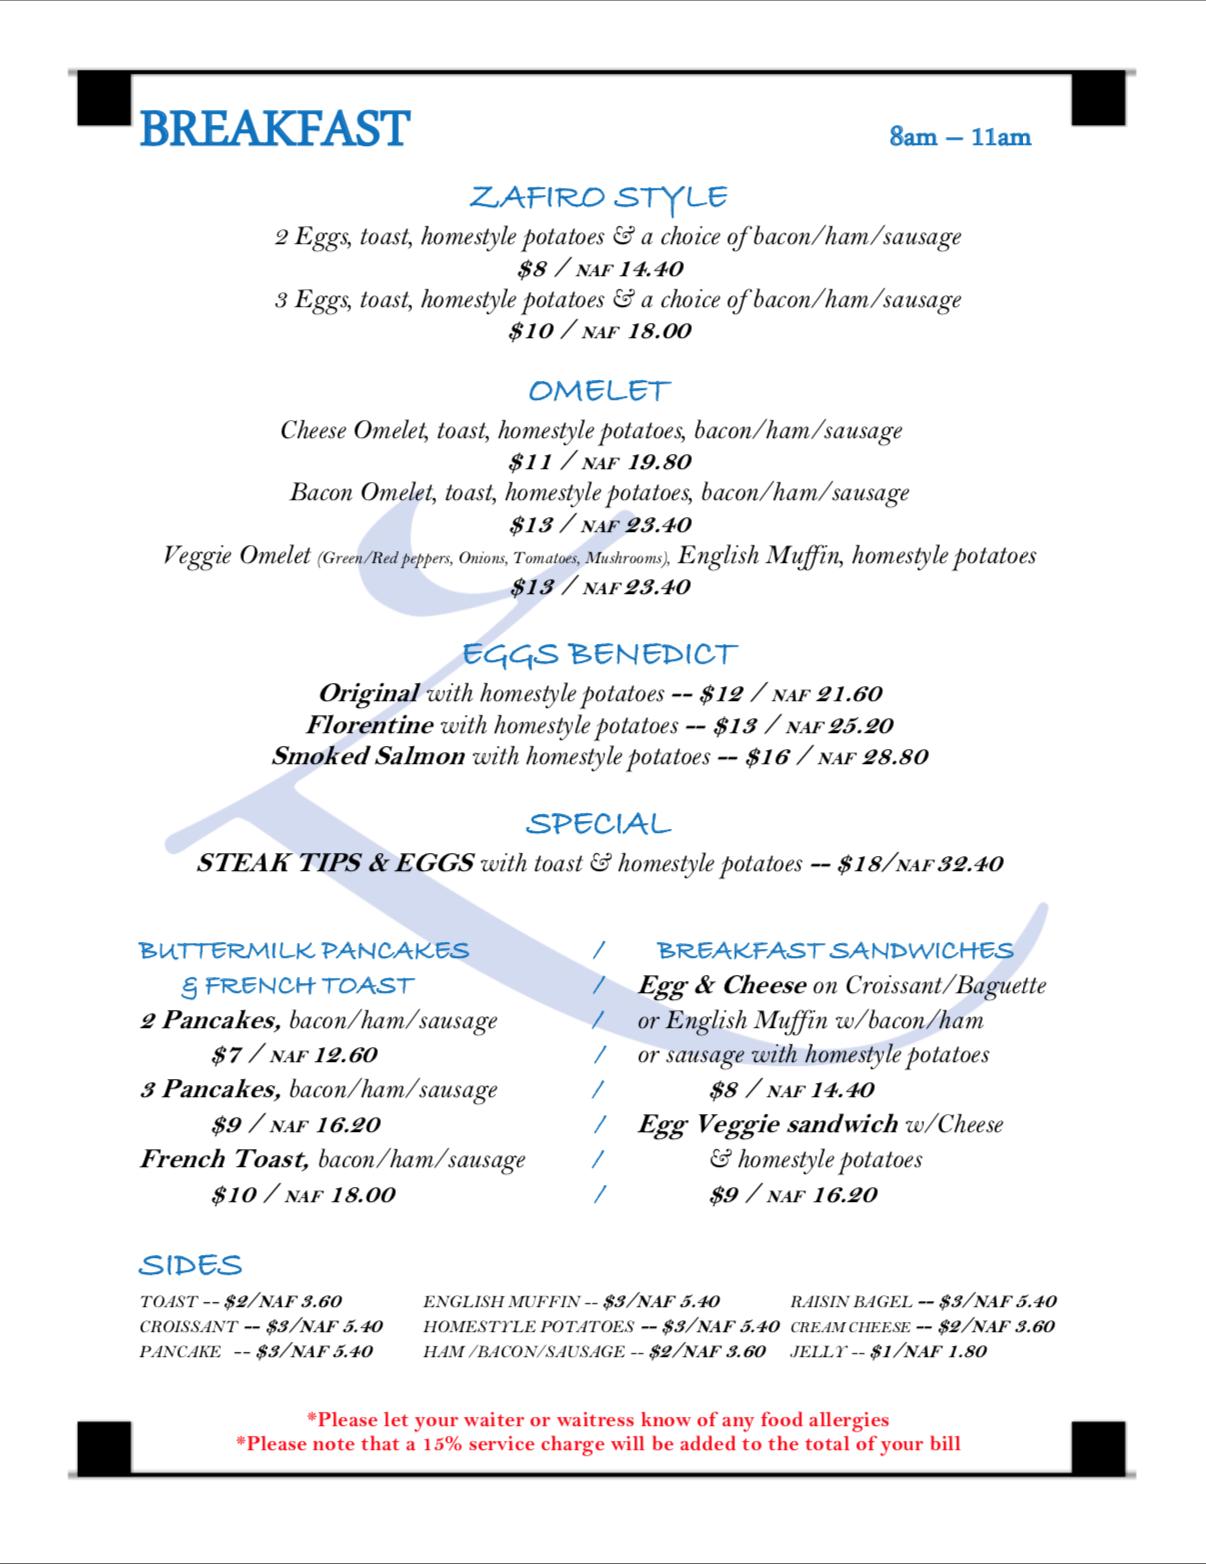 Click To view full breakfast menu